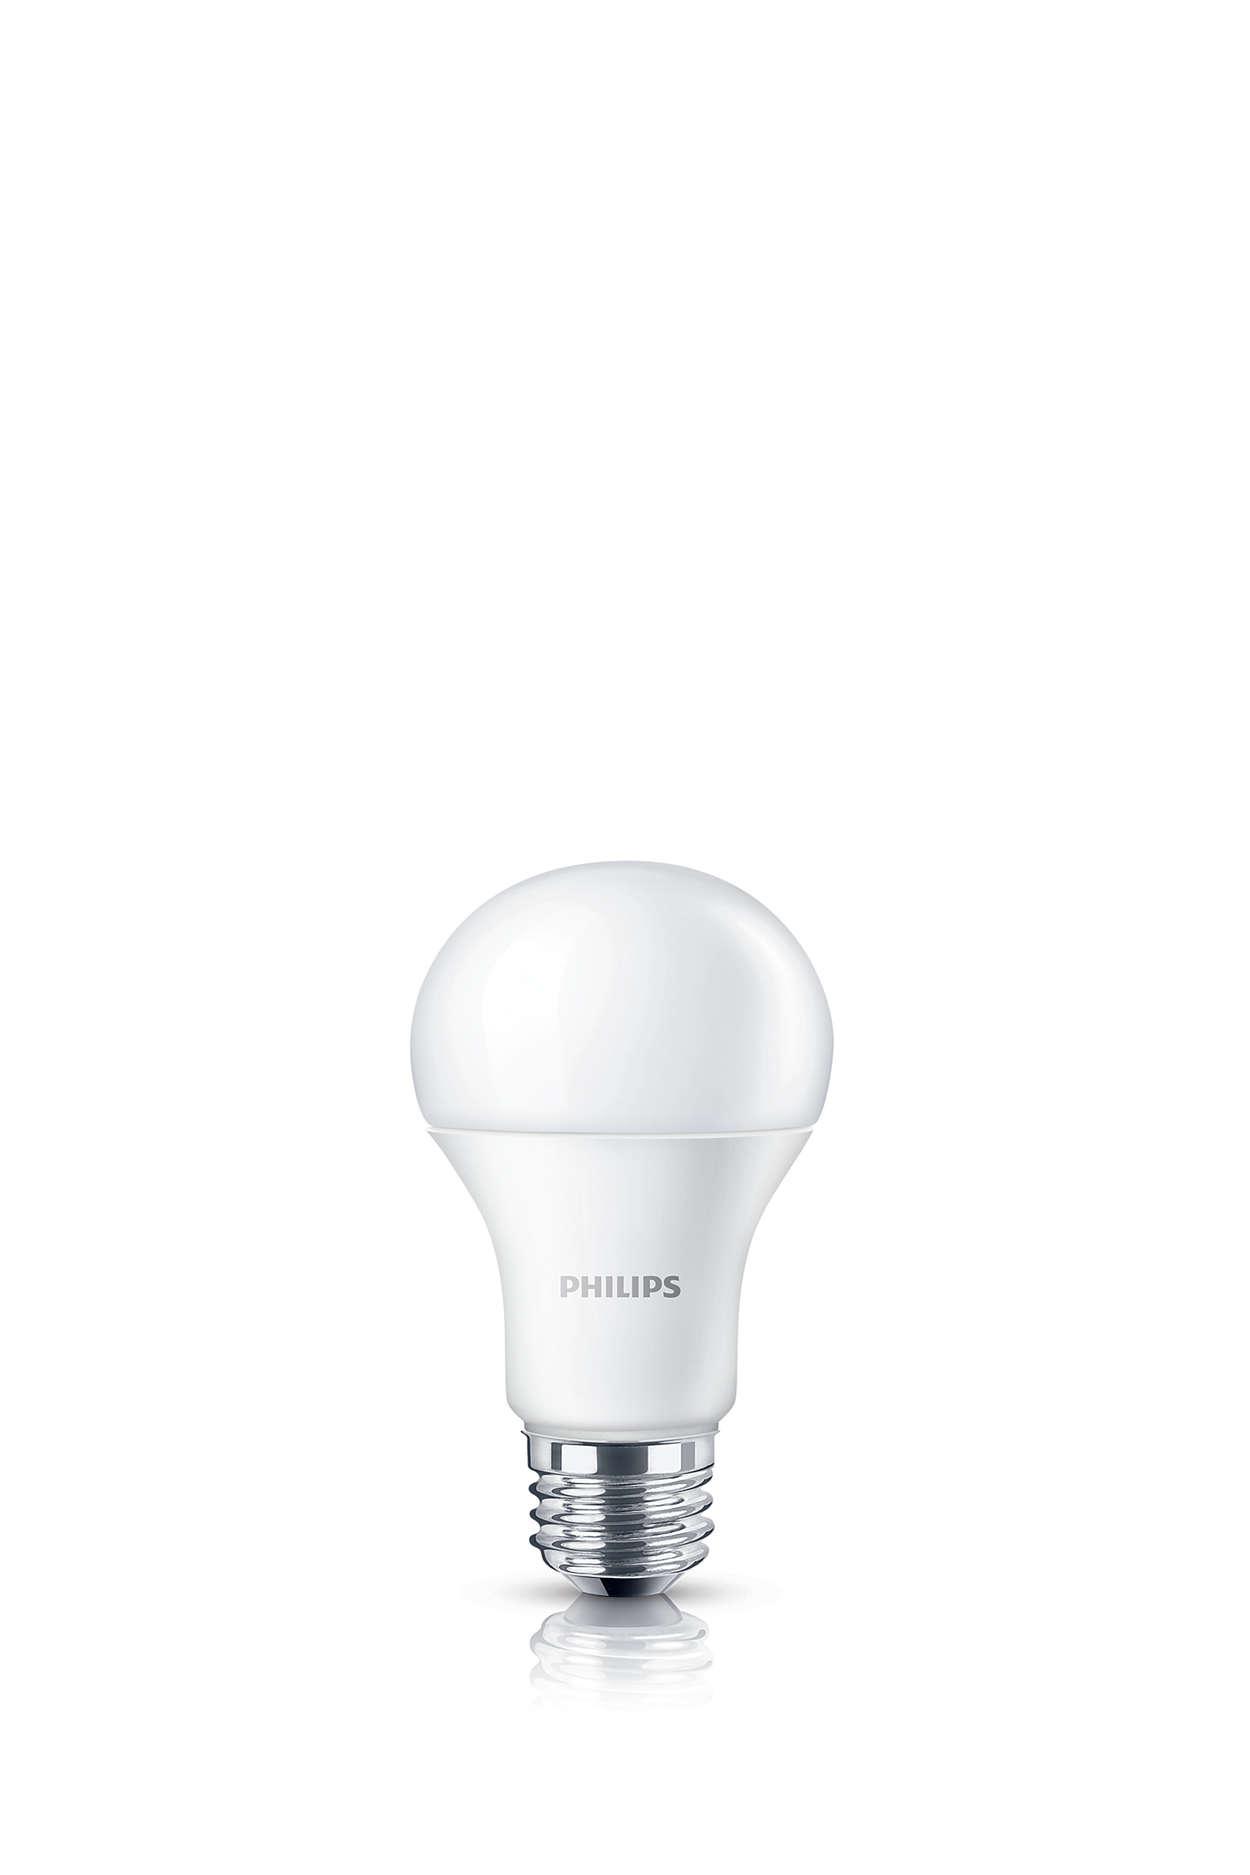 Designet til perfekt lyskvalitet